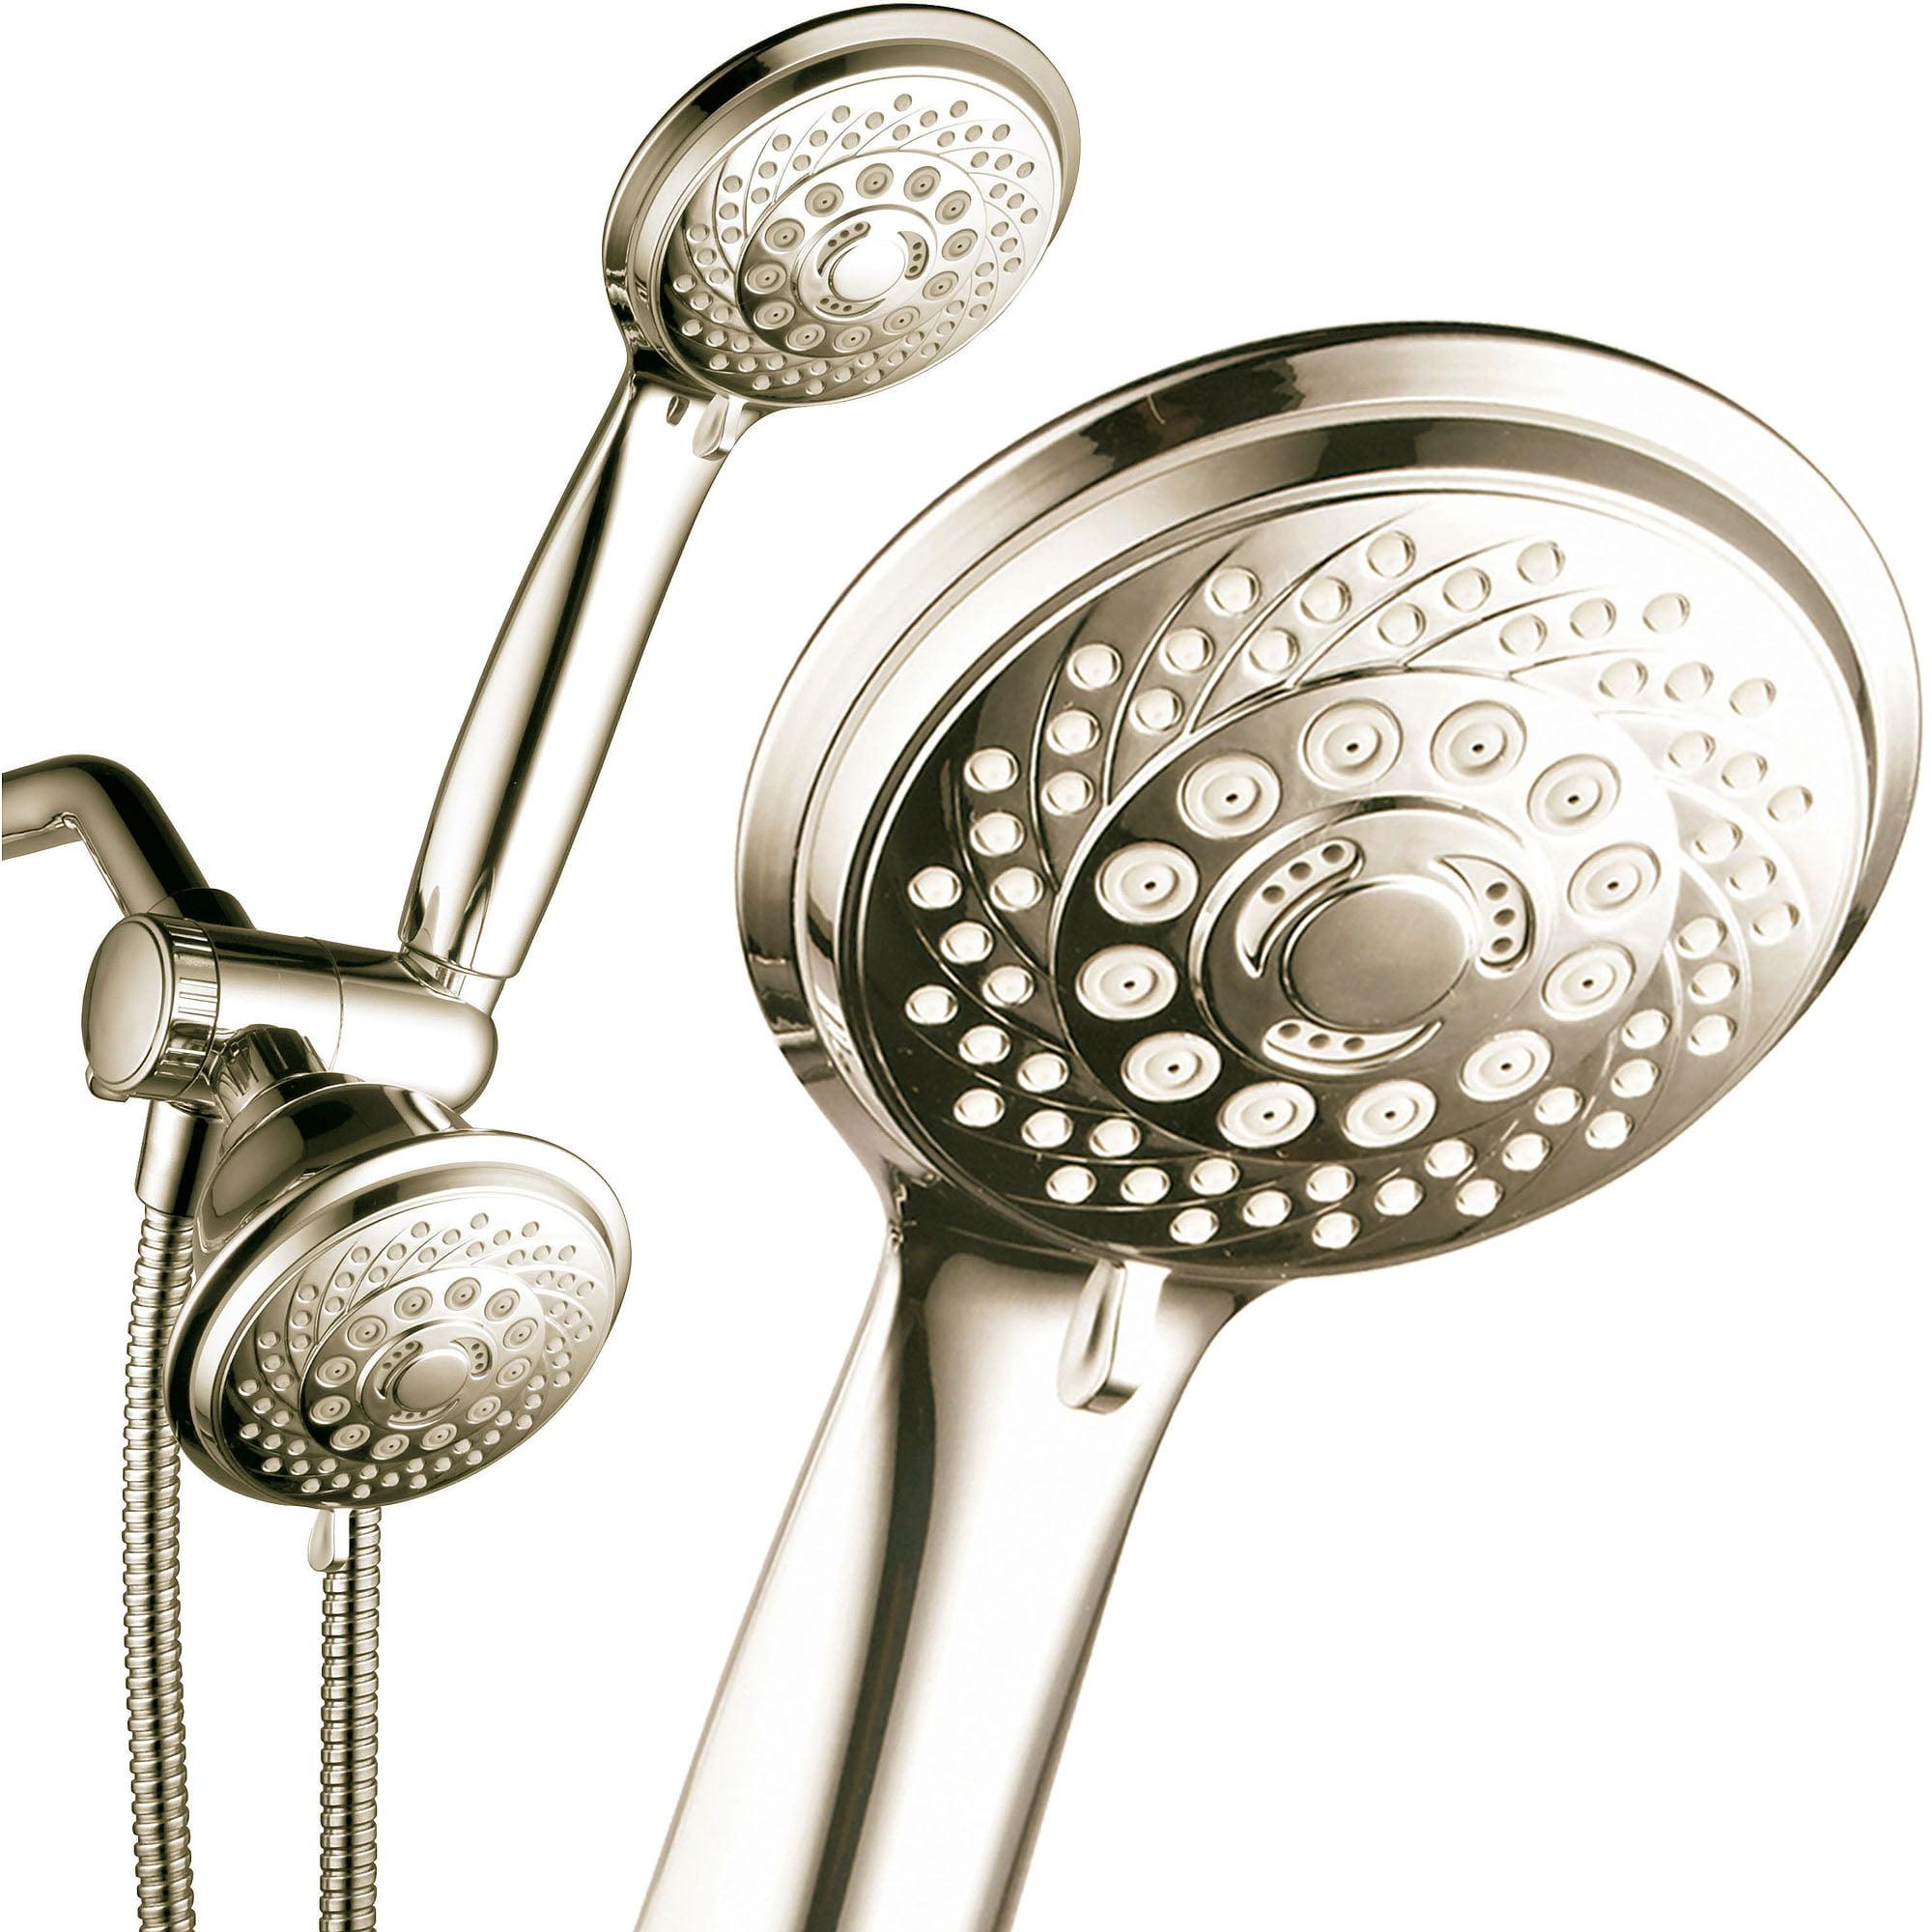 Buy PowerSpa 28-Setting Luxury 3-Way Shower Combo, Brushed Nickel by Generic